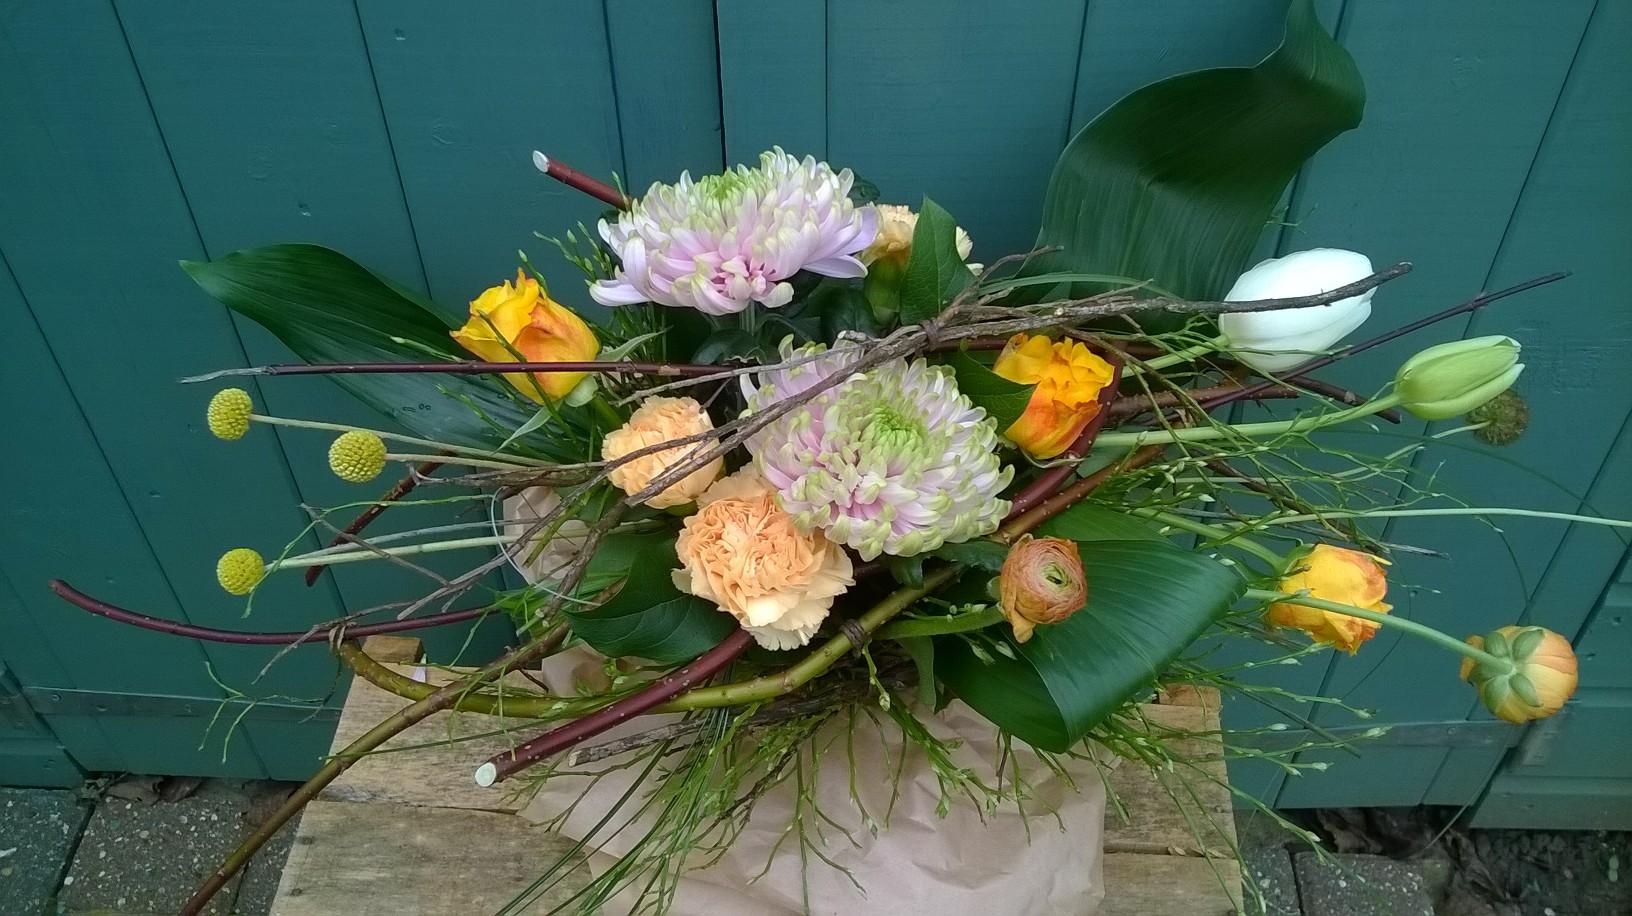 Thrive Horizontal Spring Bouquet.jpg